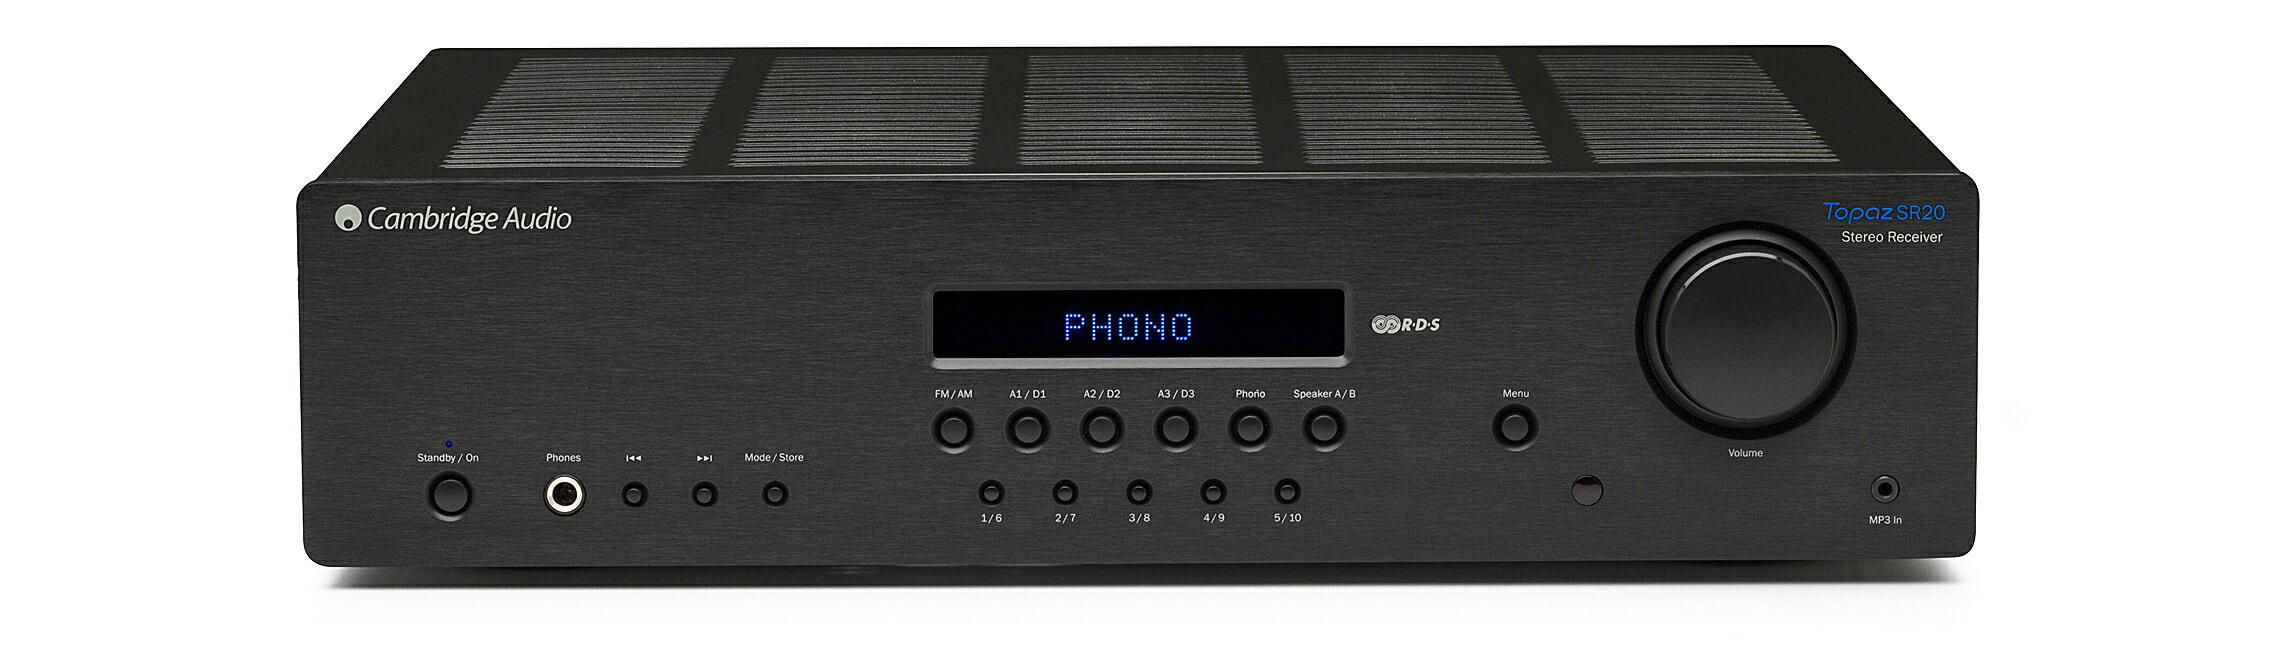 【Topaz SR-20 大功率數位立體聲收音擴大機】Cambridge Audio 英國劍橋音響 家庭劇院 CD BD AV 擴大機 無線數位串流 藍芽 網路收音機